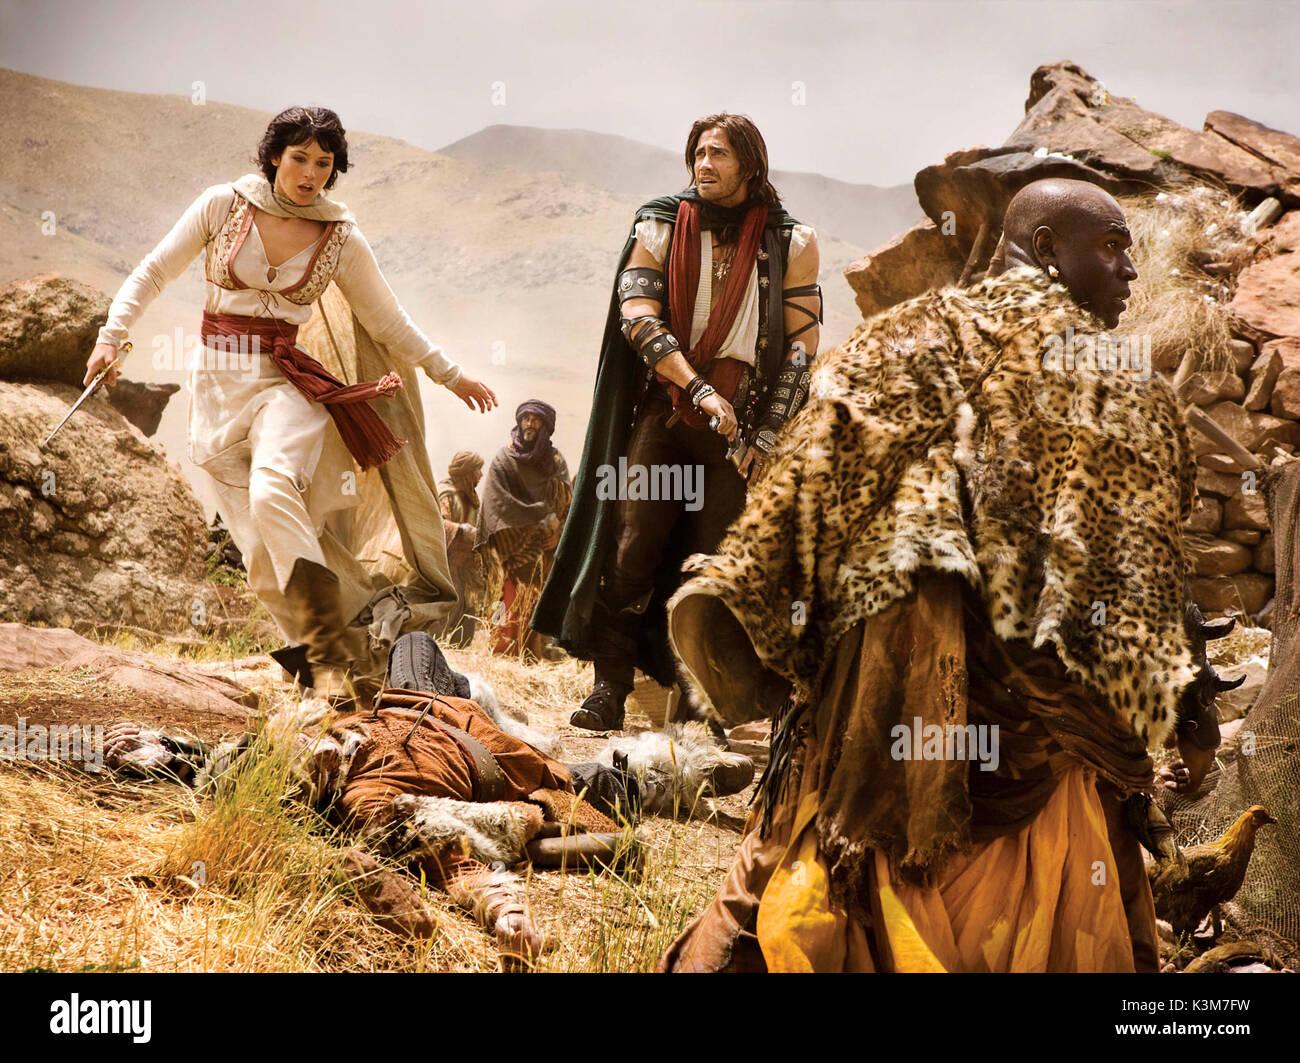 Prince Of Persia The Sands Of Time Gemma Arterton Jake Gyllenhaal Stock Photo Alamy